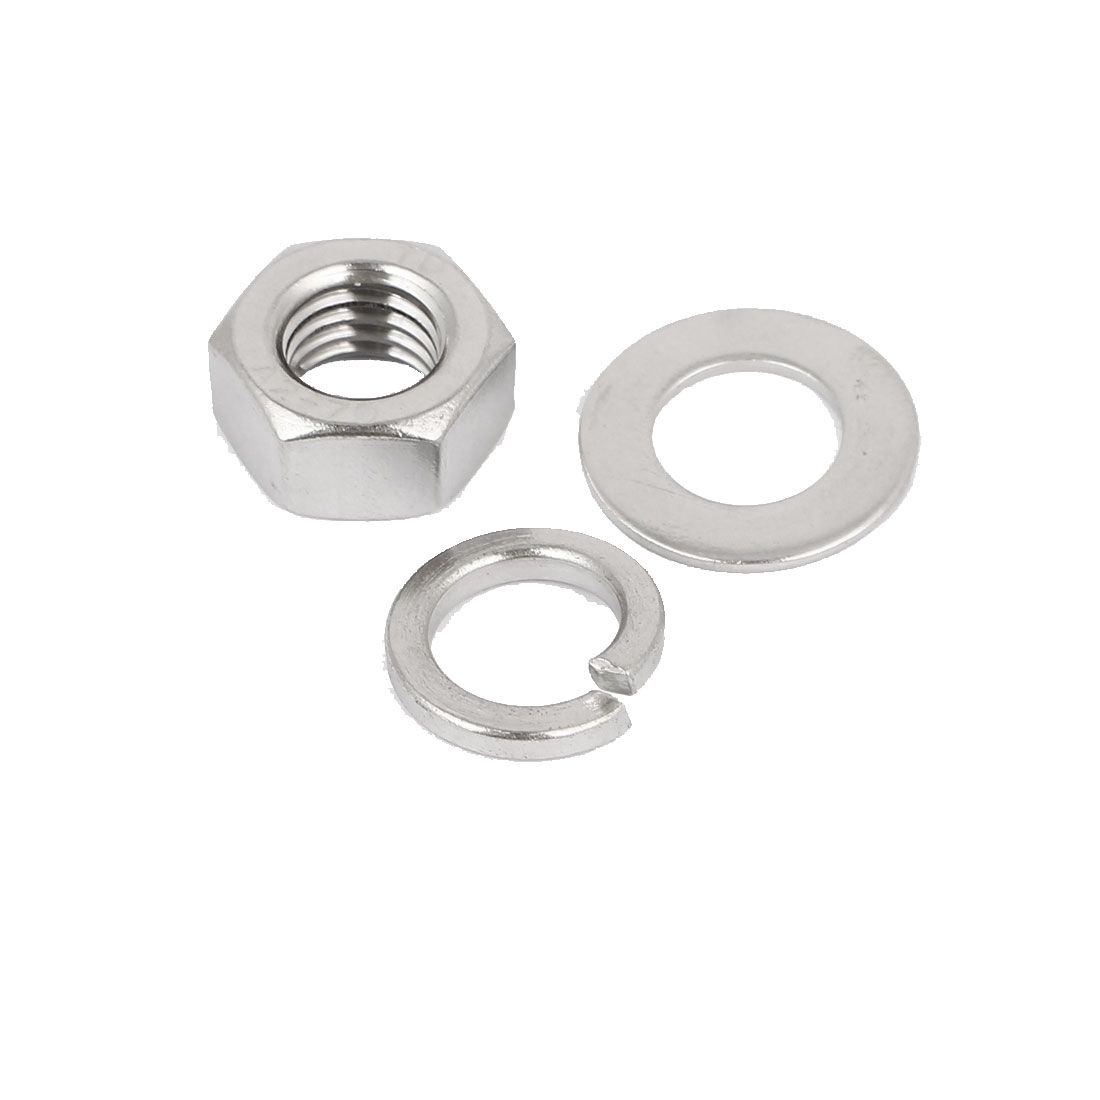 M12 Thread Diameter 304 Stainless Steel Hex Nut Flat Washer Split Lock 5 Sets - image 1 of 3